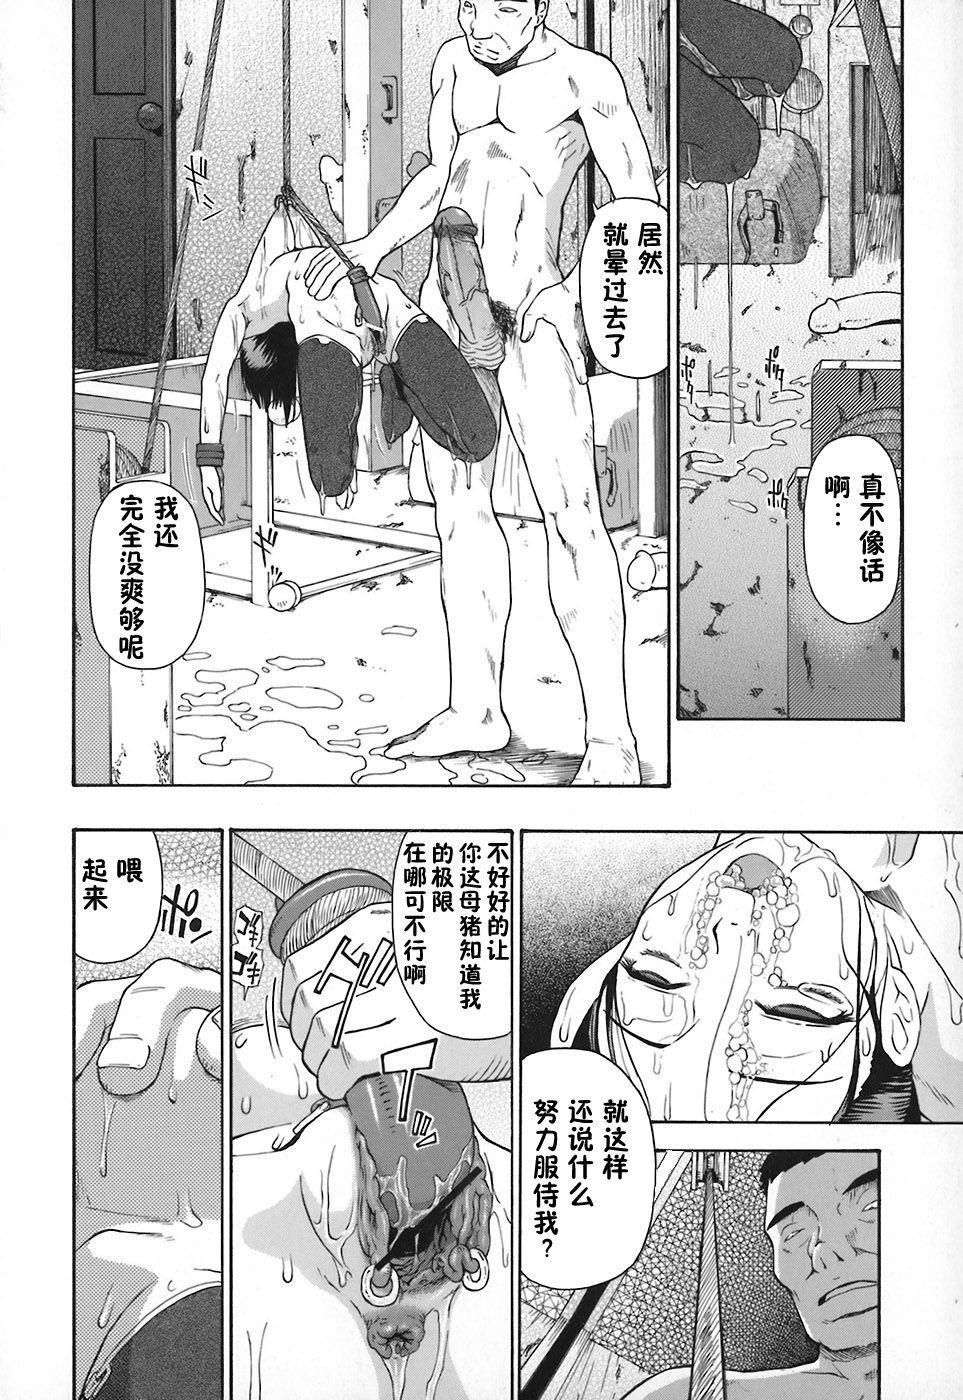 Akutoku no Sakae - Prosperites du Vice 93